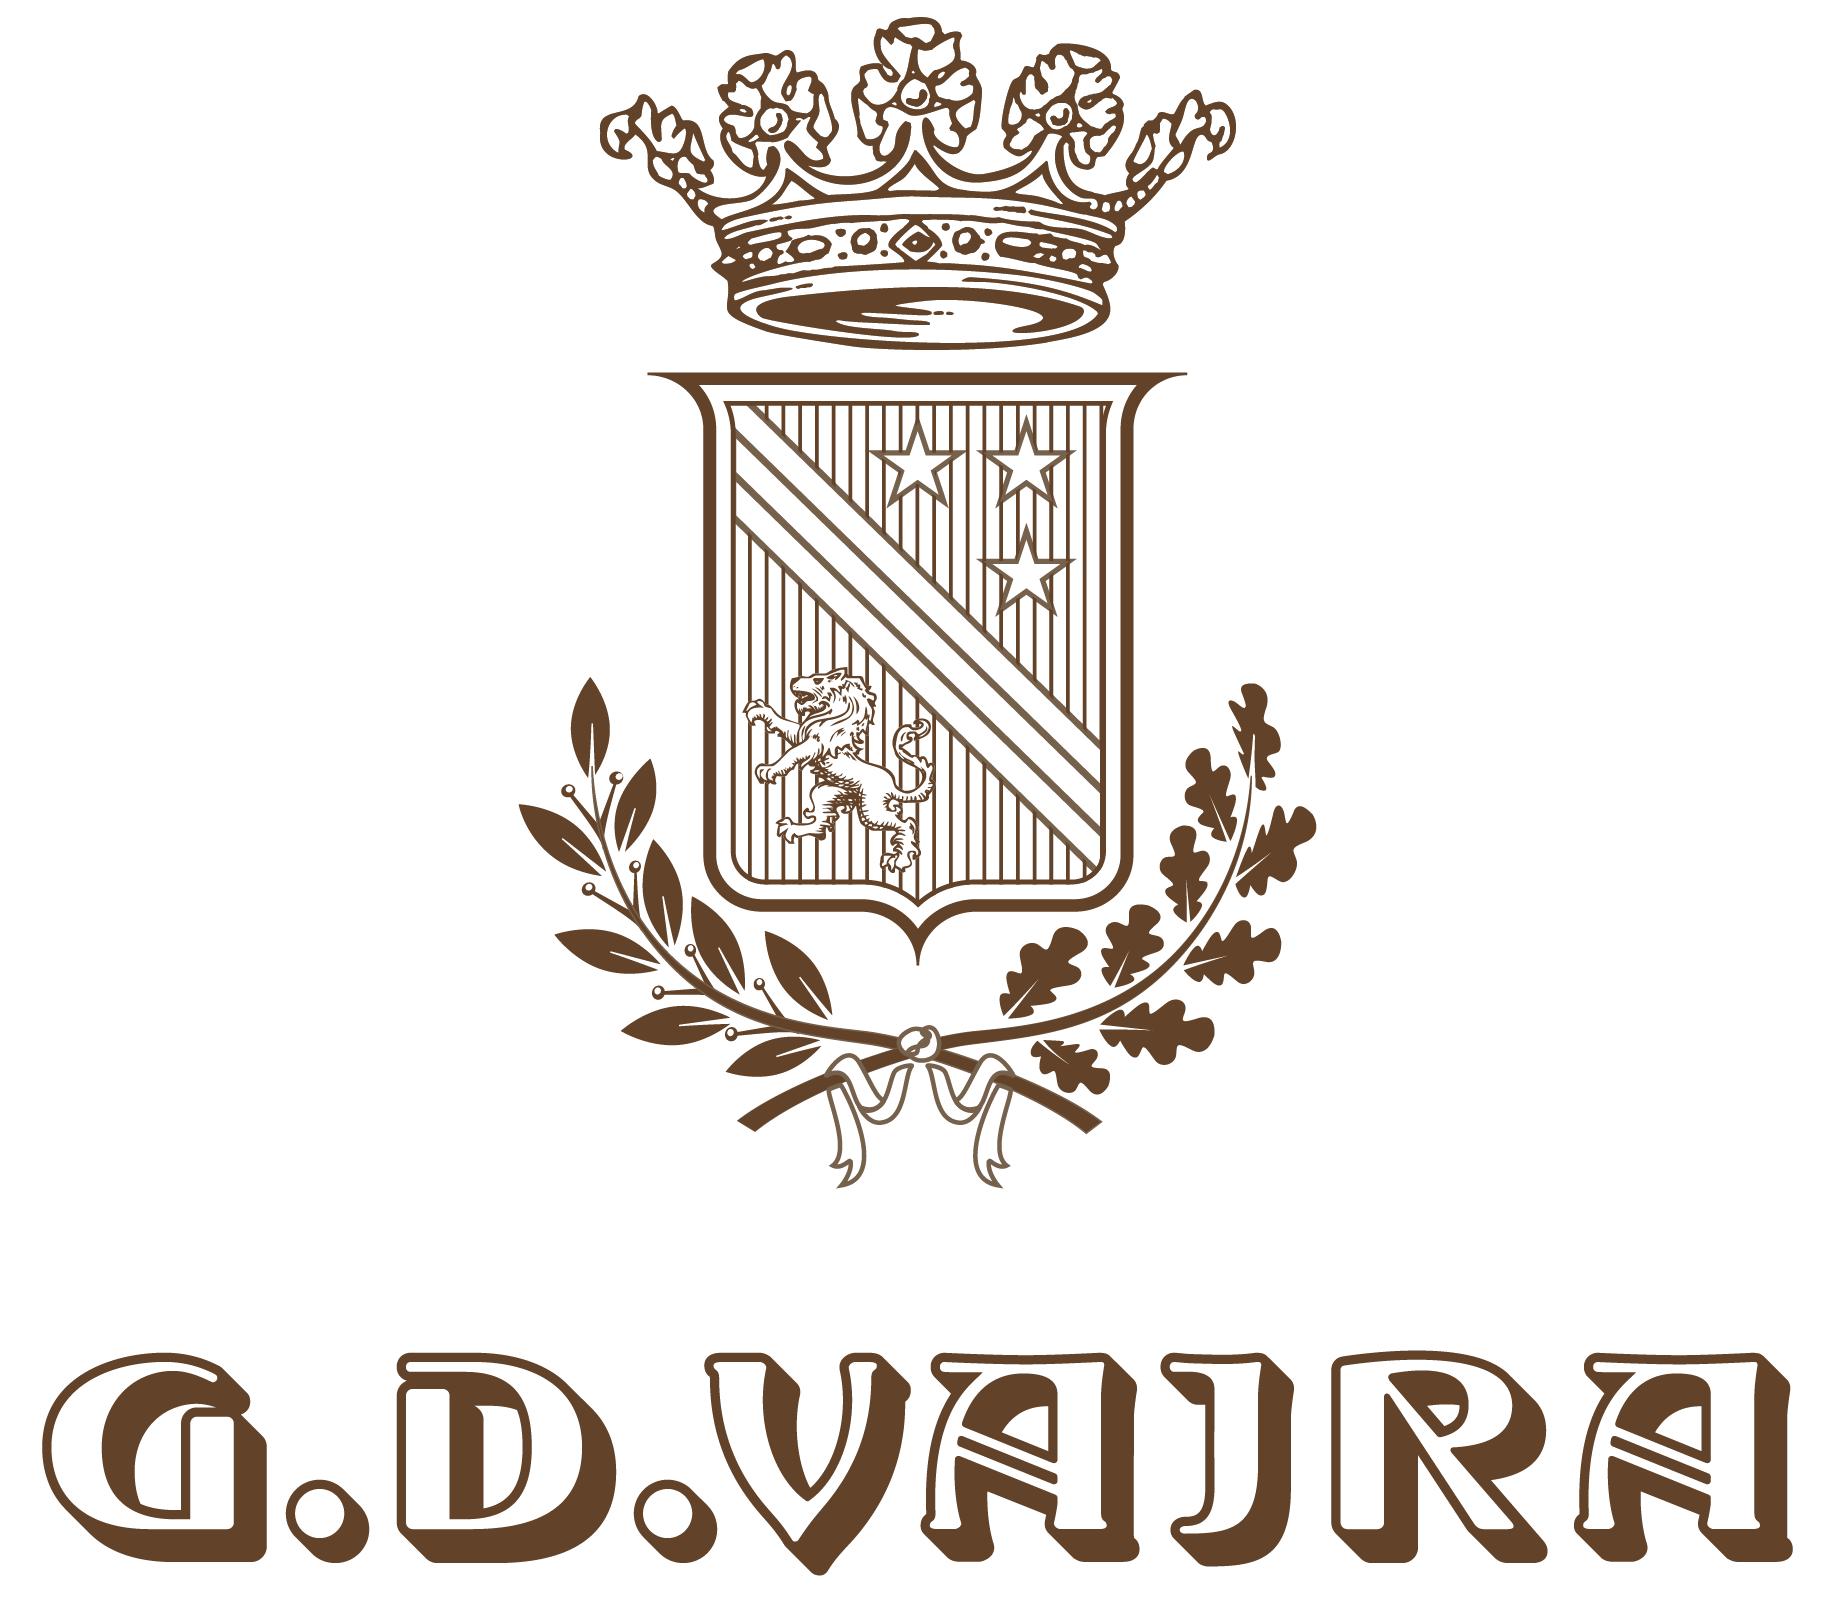 G. D. Vajra